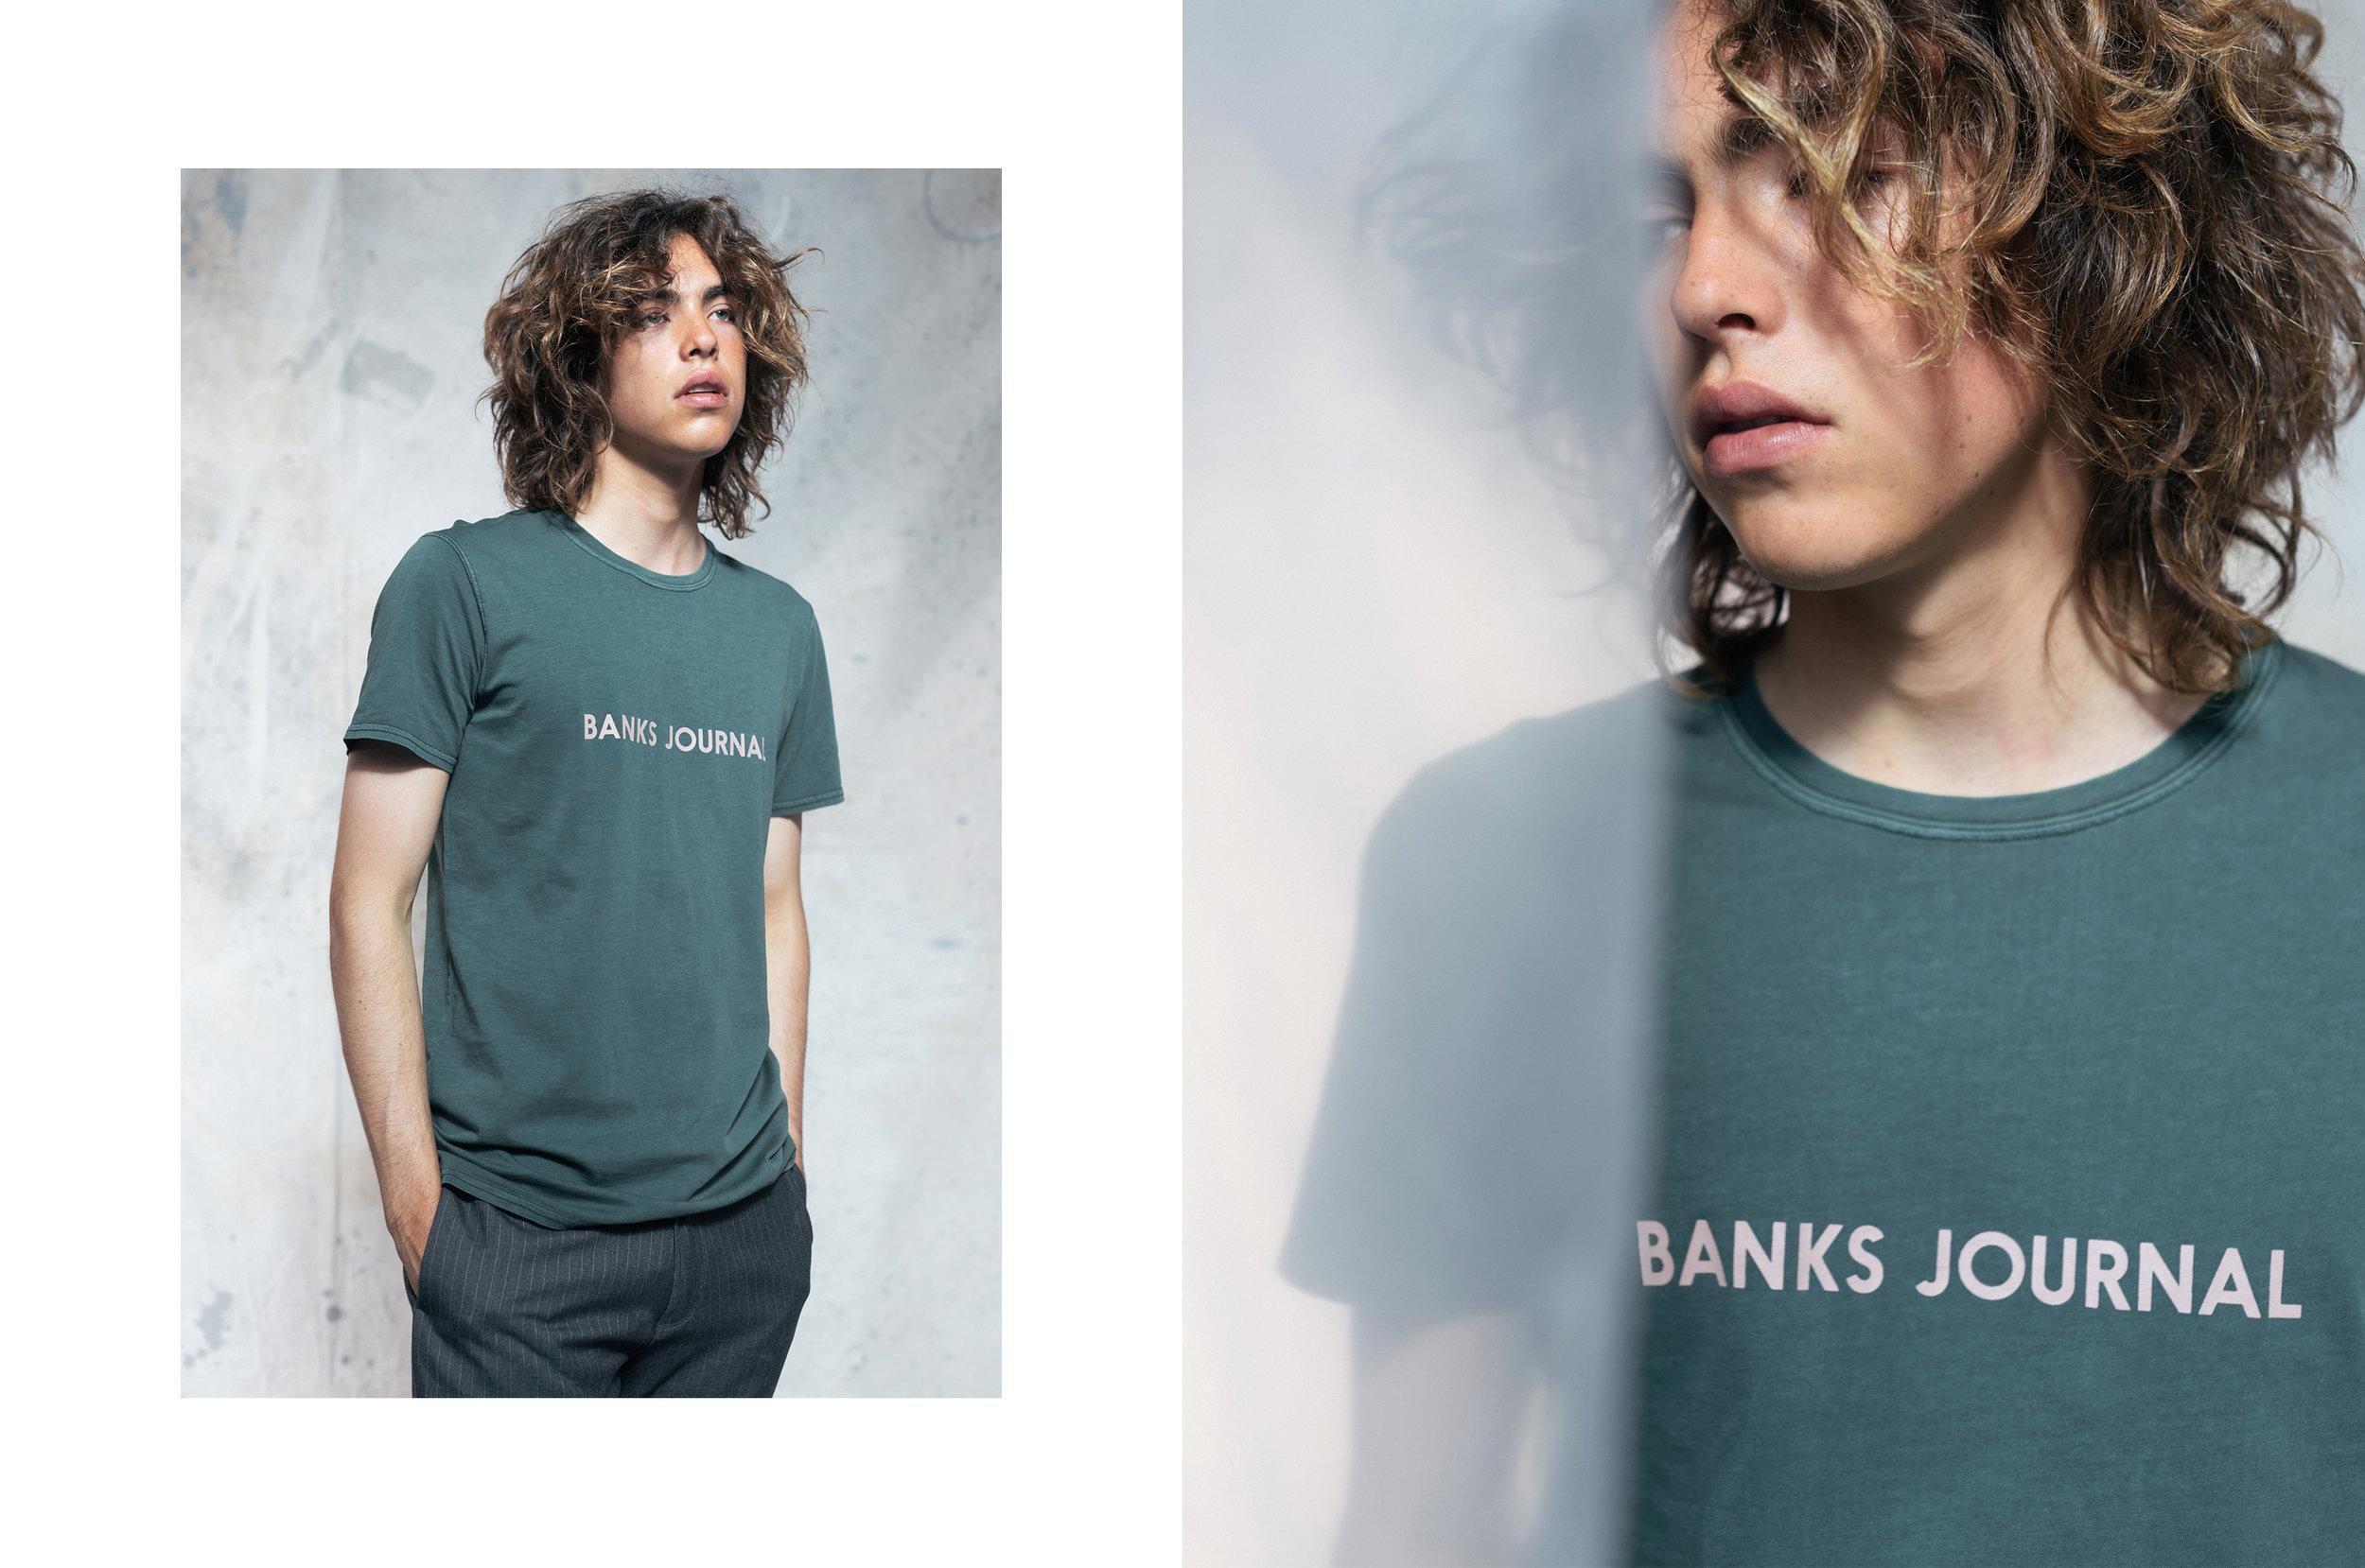 BanksJournal_FA18_Lookbook_Studio_1_08_2880x.jpg